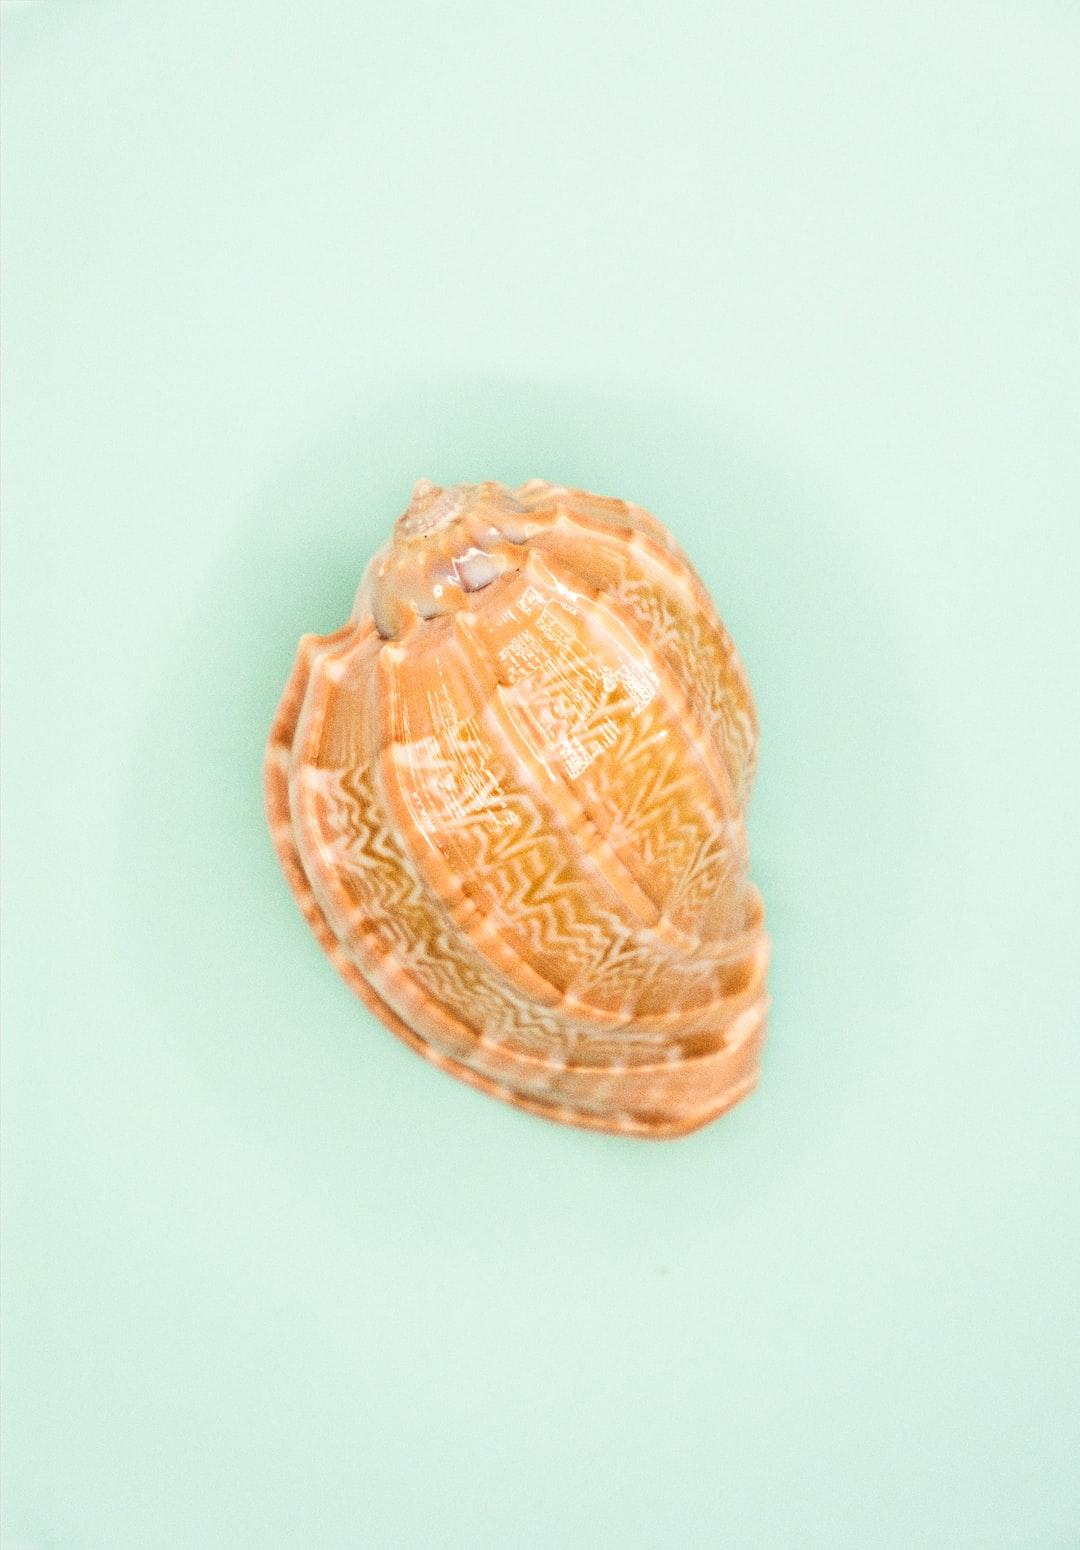 Still life shell 2  👋 Small donation -> huge appreciation paypal.me/DanieleFranchi 🙏🙏🙏